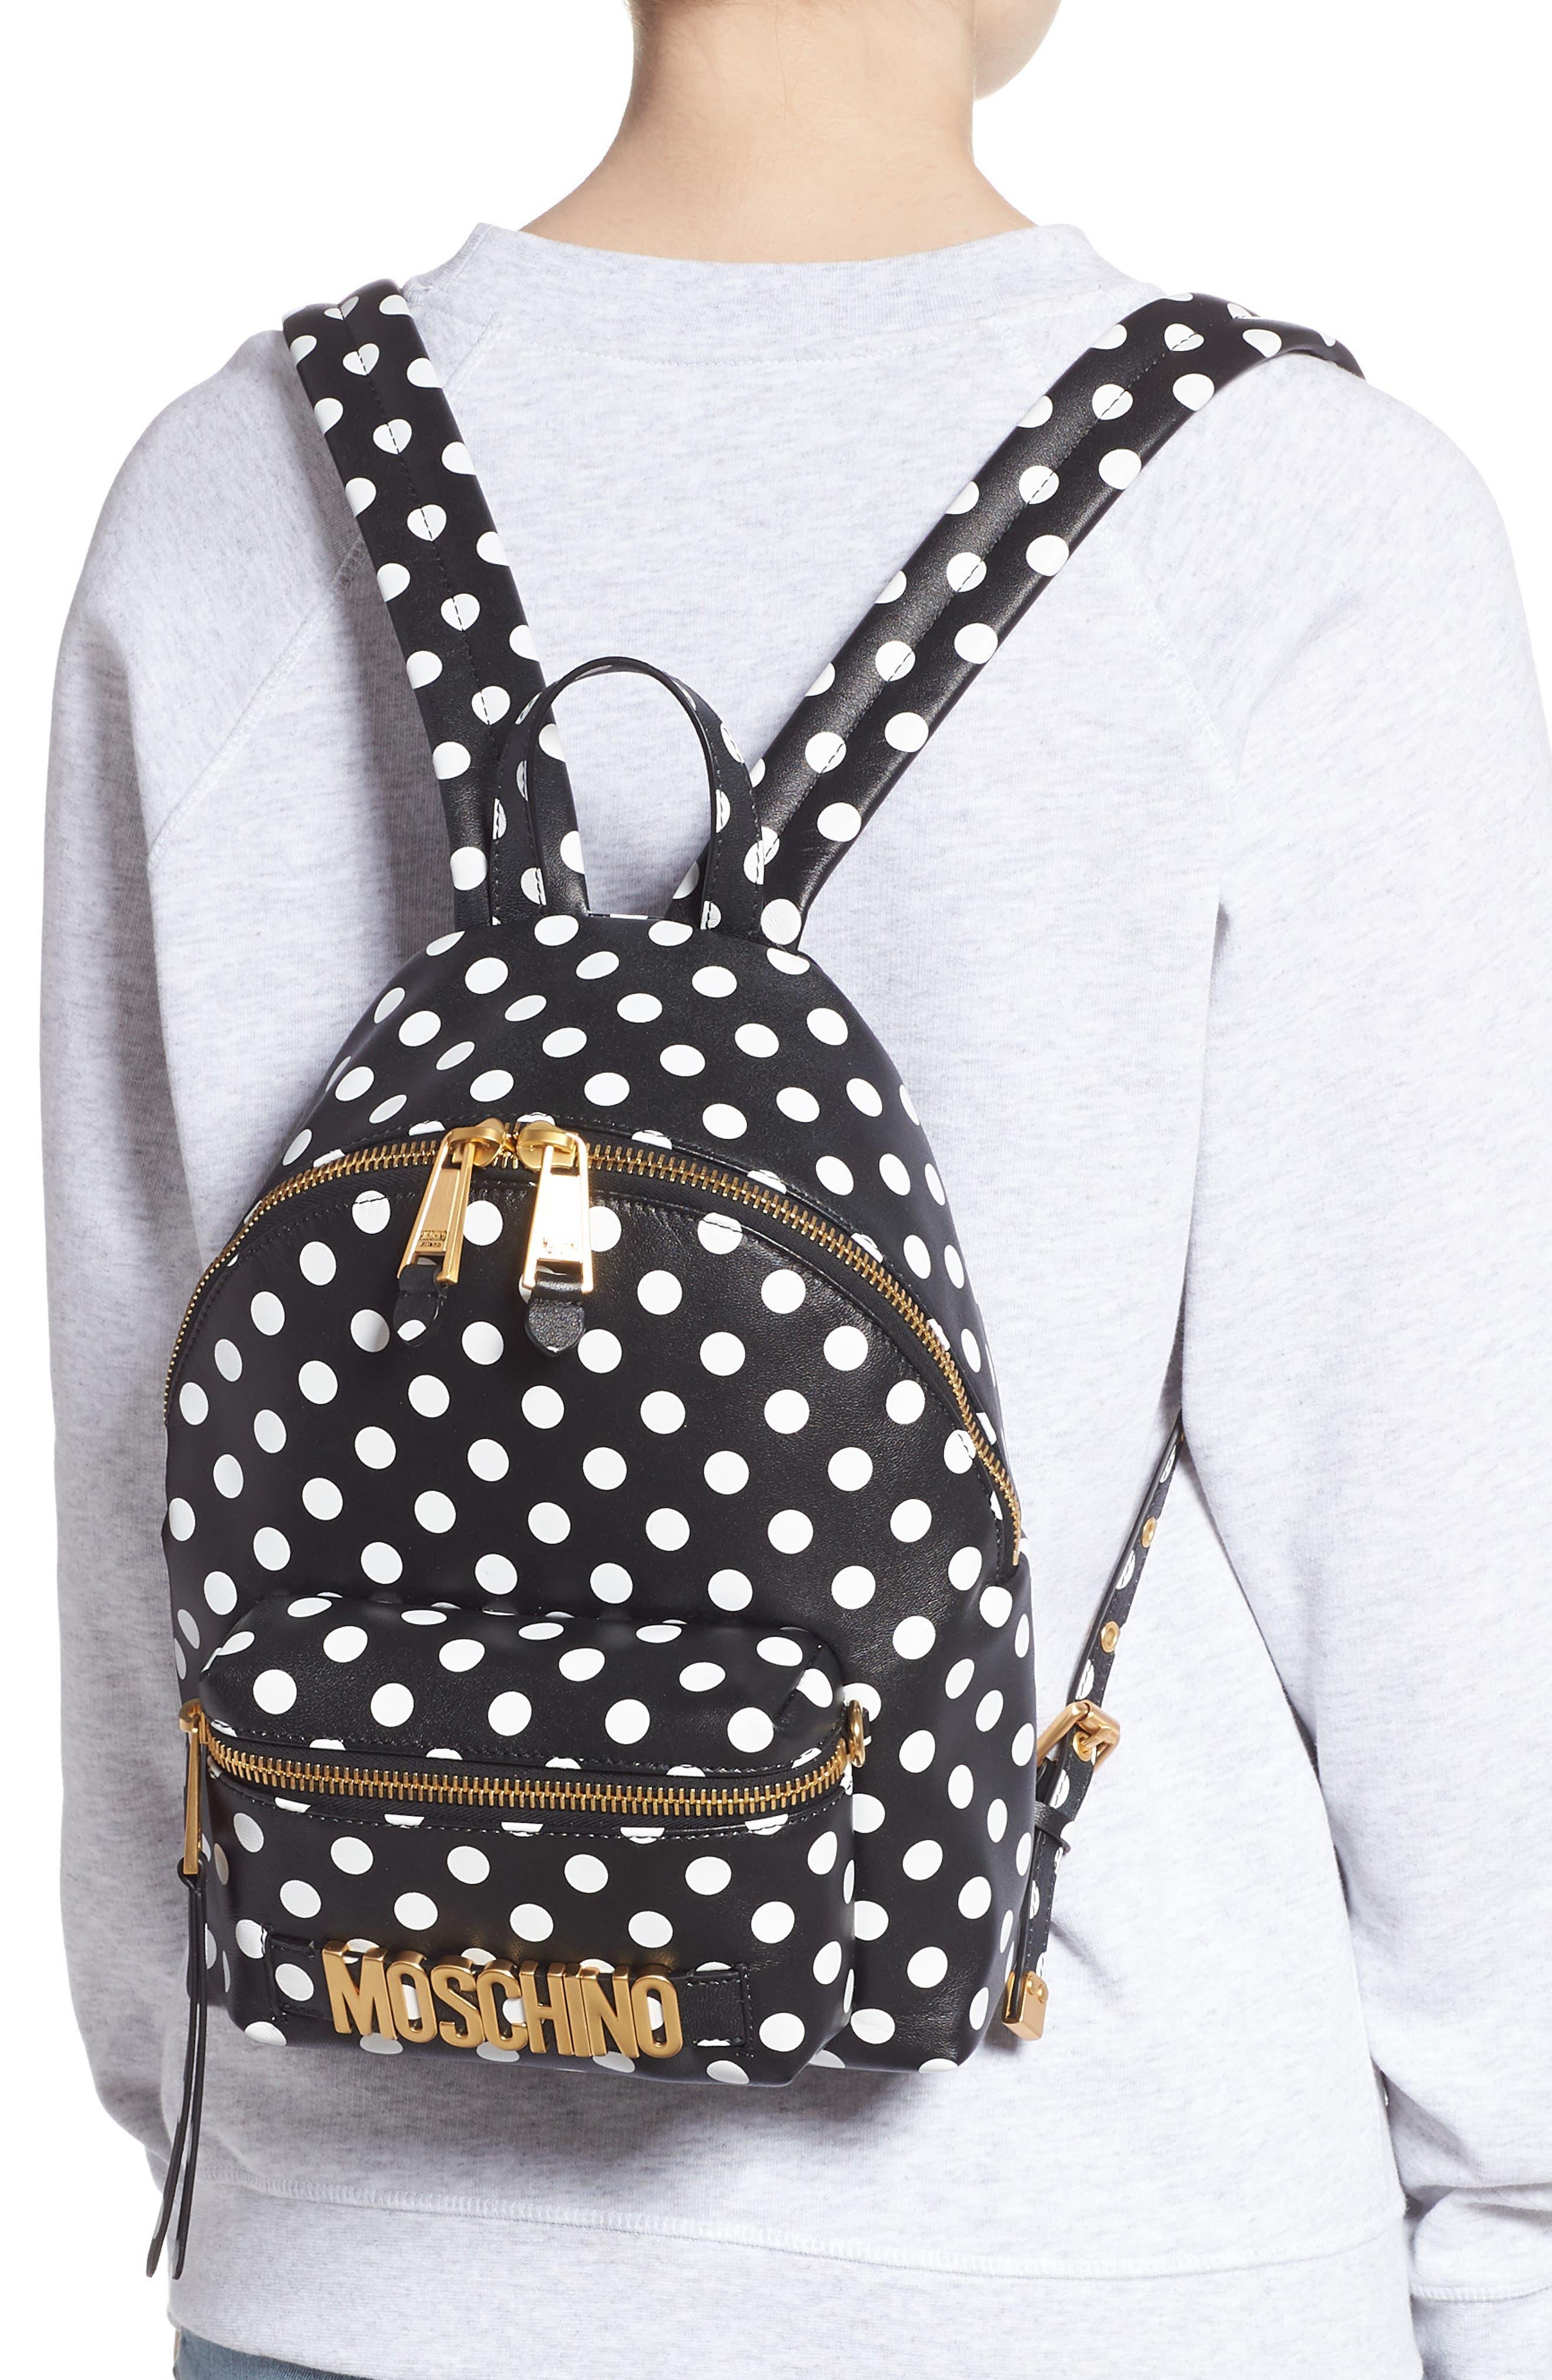 MOSCHINO, Logo Polka Dot Backpack, Alternate thumbnail 2, color, BLACK/ WHITE